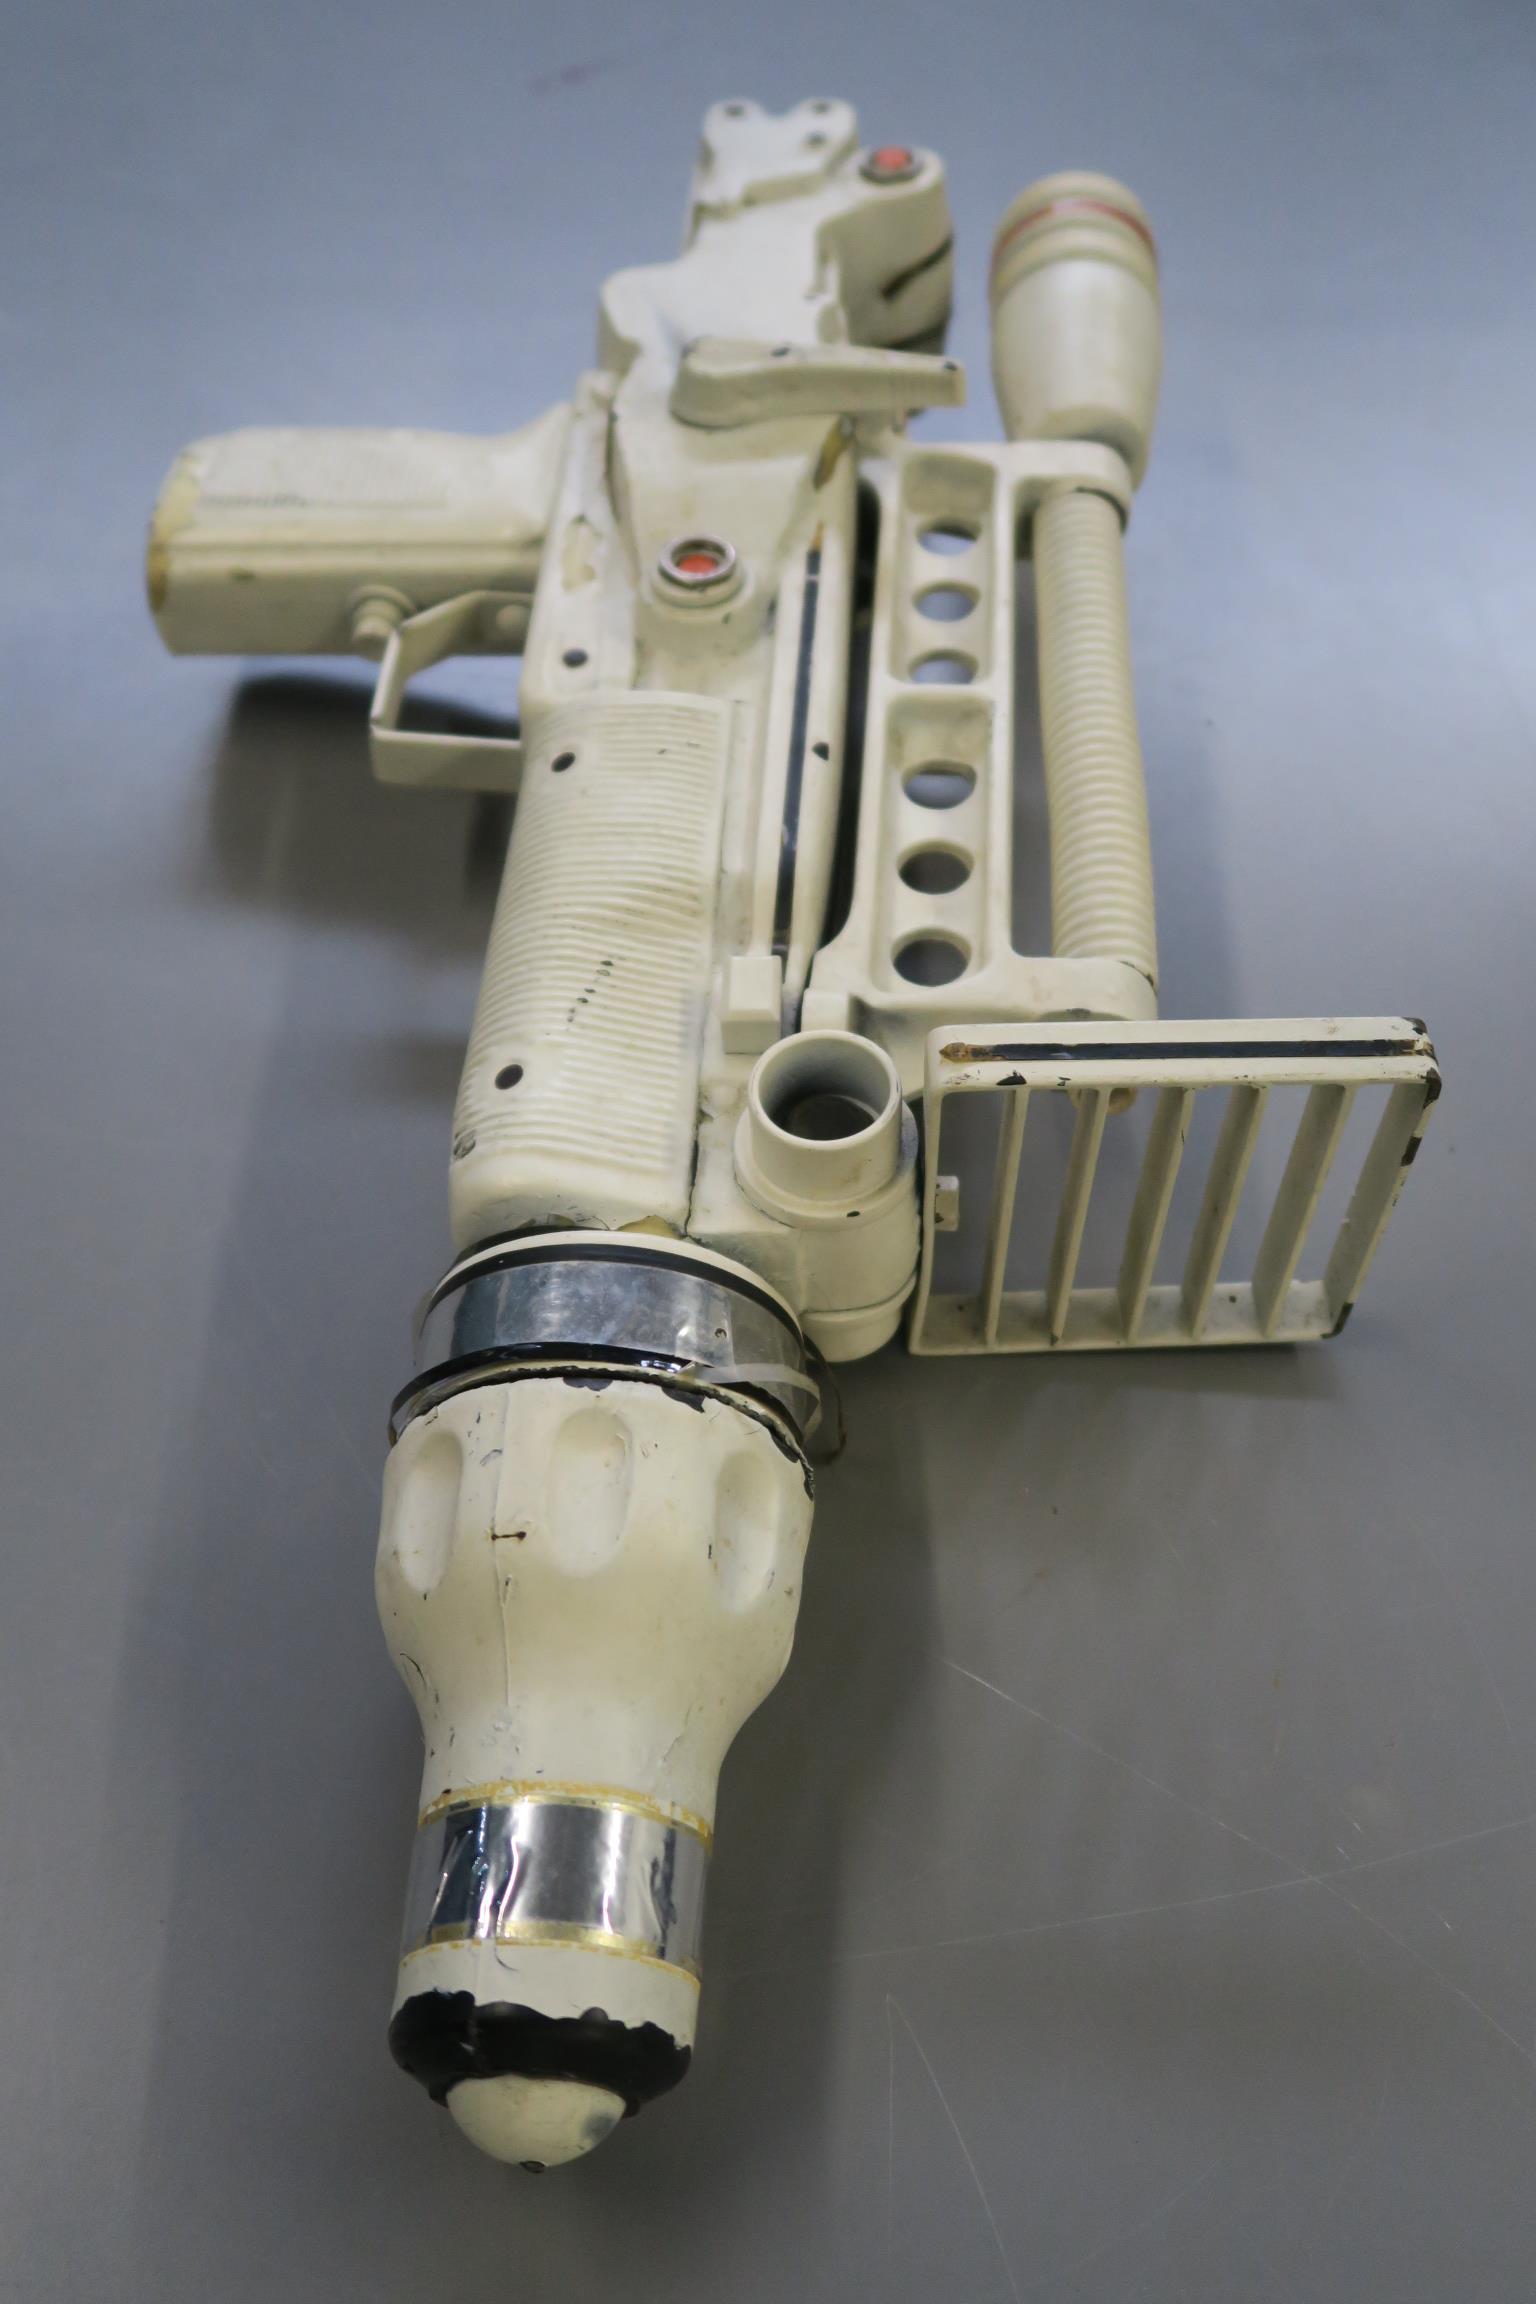 JAMES BOND 007 : Moonraker laser rifle created especially for this futuristic James Bond 1979 film. - Image 2 of 7